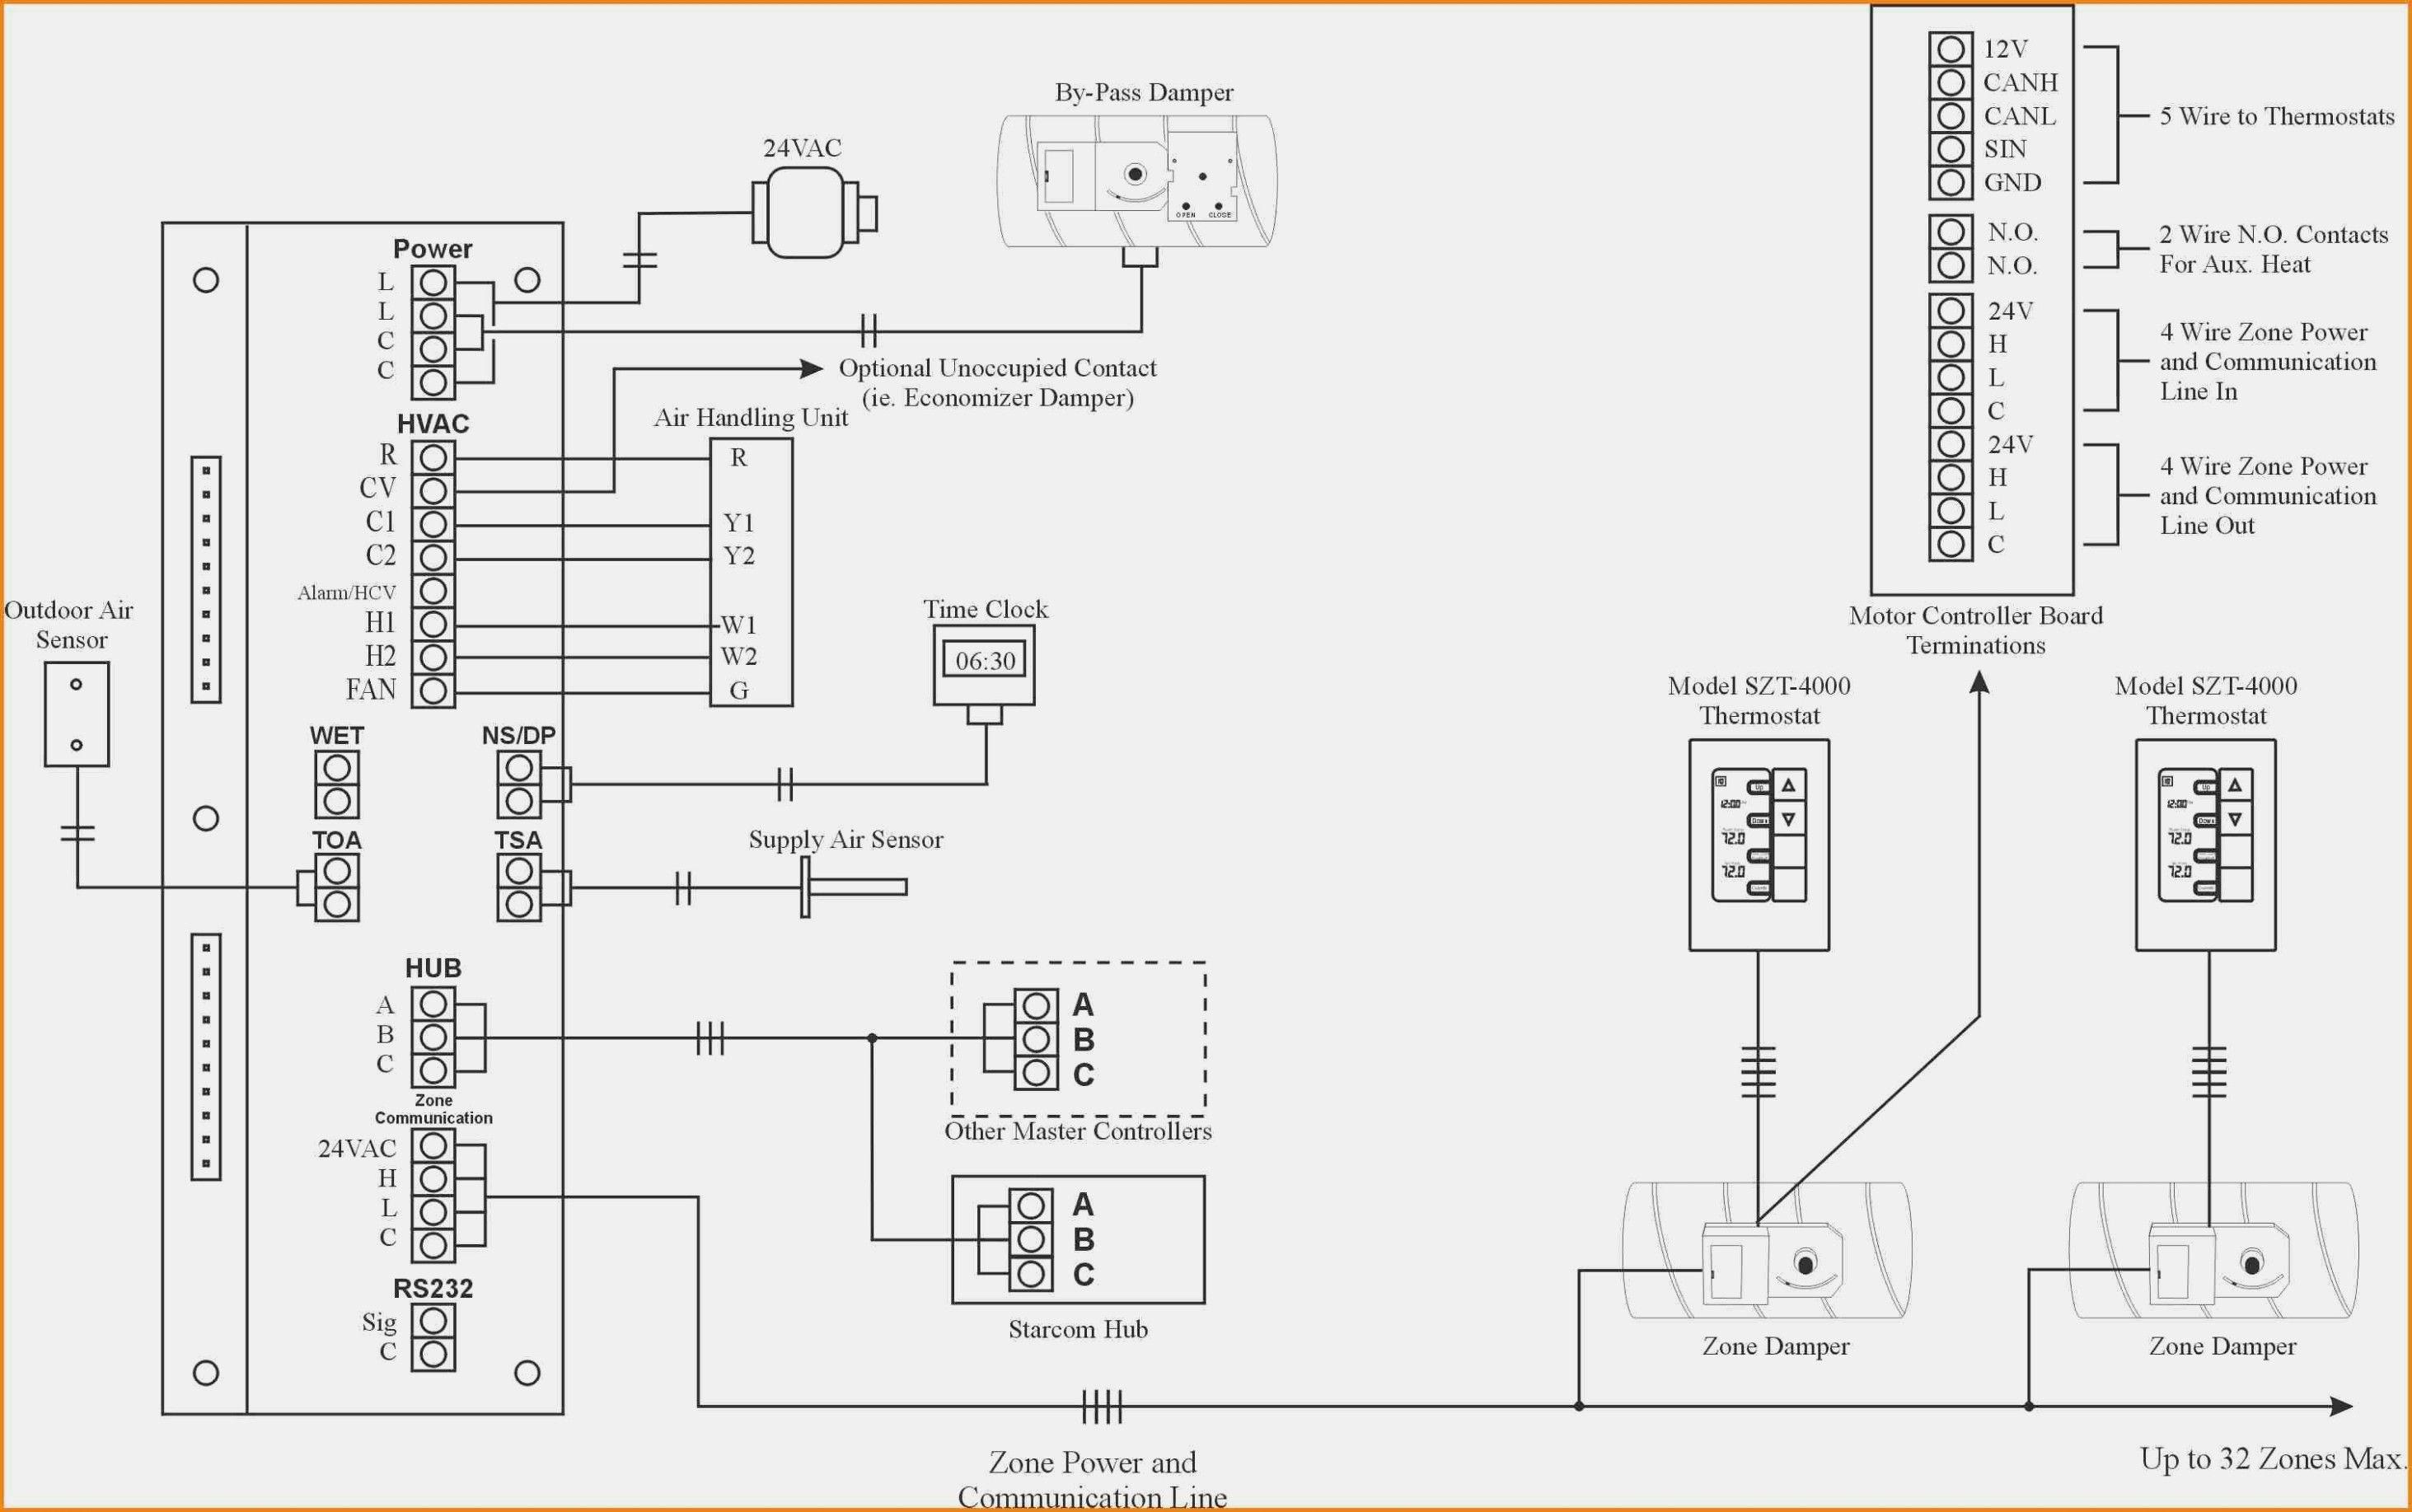 Unique Fire Alarm System Control Module Wiring Diagram Diagram Diagramtemplate Diagramsample